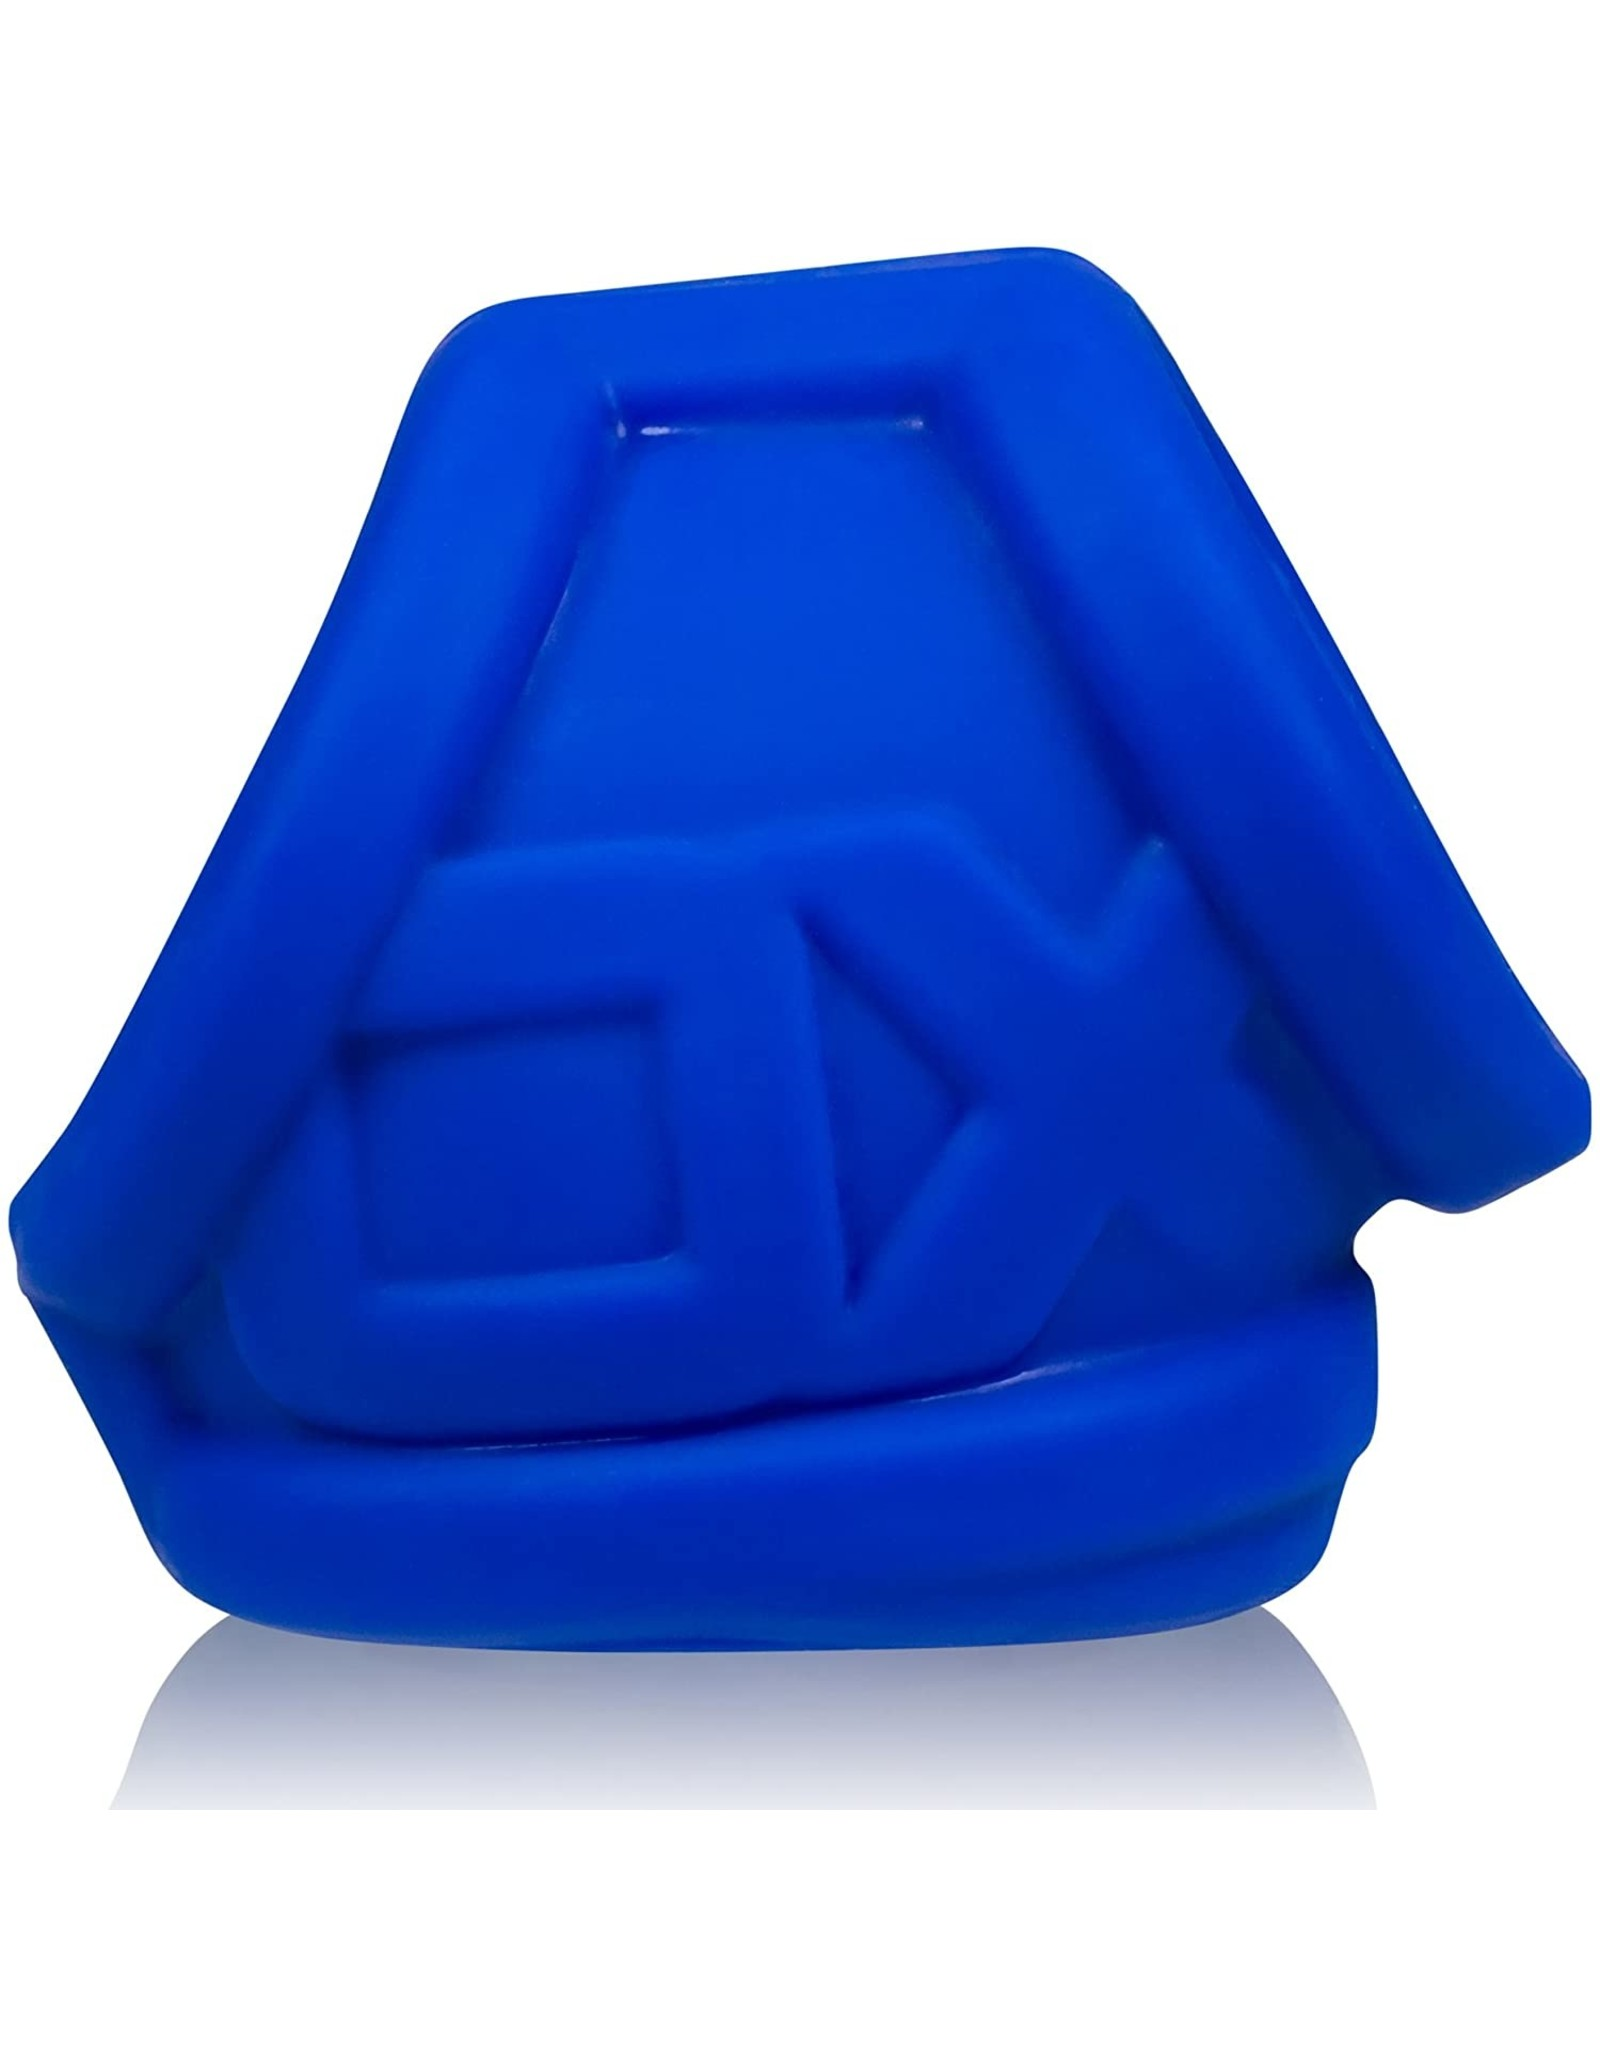 OXBALLS OXBALLS - OXSLING - COBALT ICE